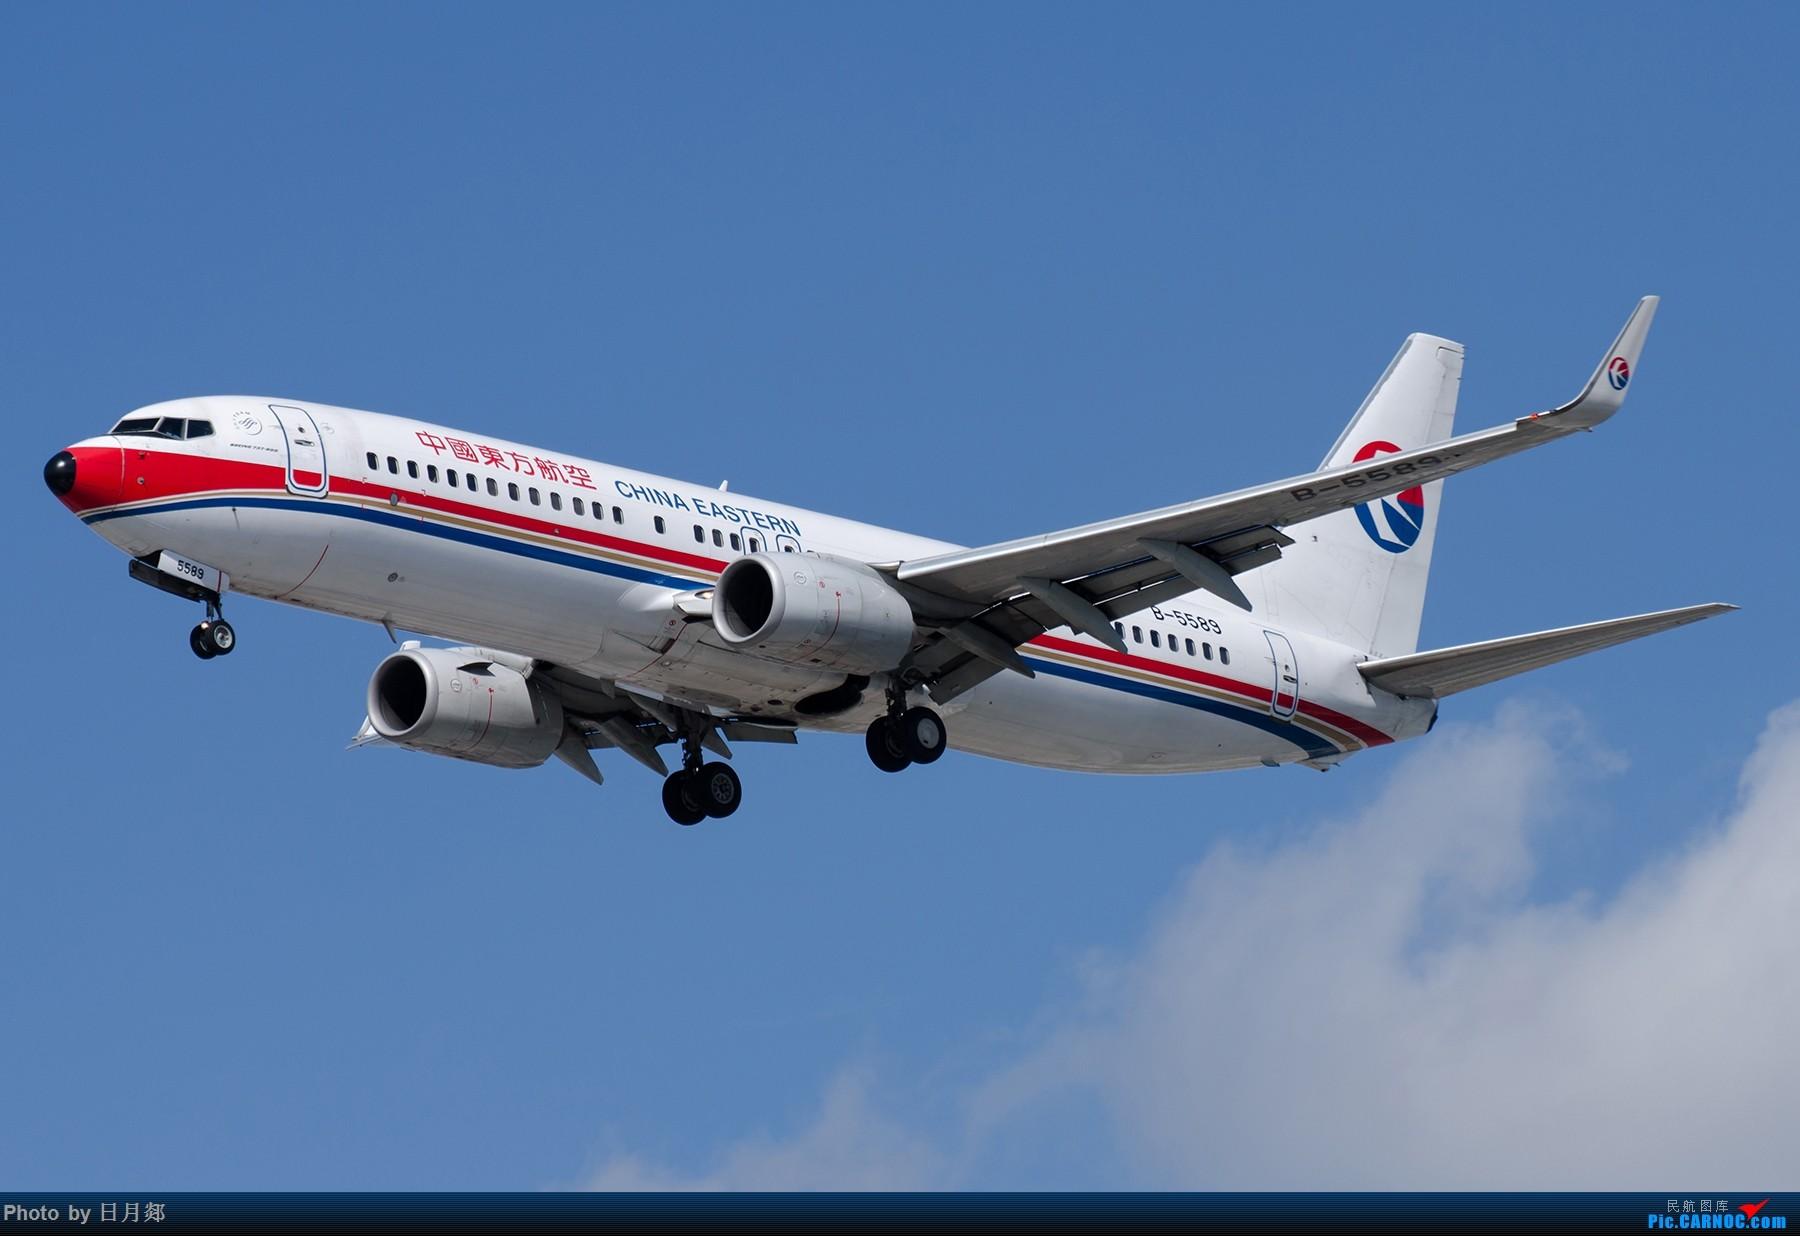 Re:[原创]【SHA拍机*1800大图】国庆的存货接着发,台风啥时候才能过去 BOEING 737-800 B-5589 中国上海虹桥国际机场